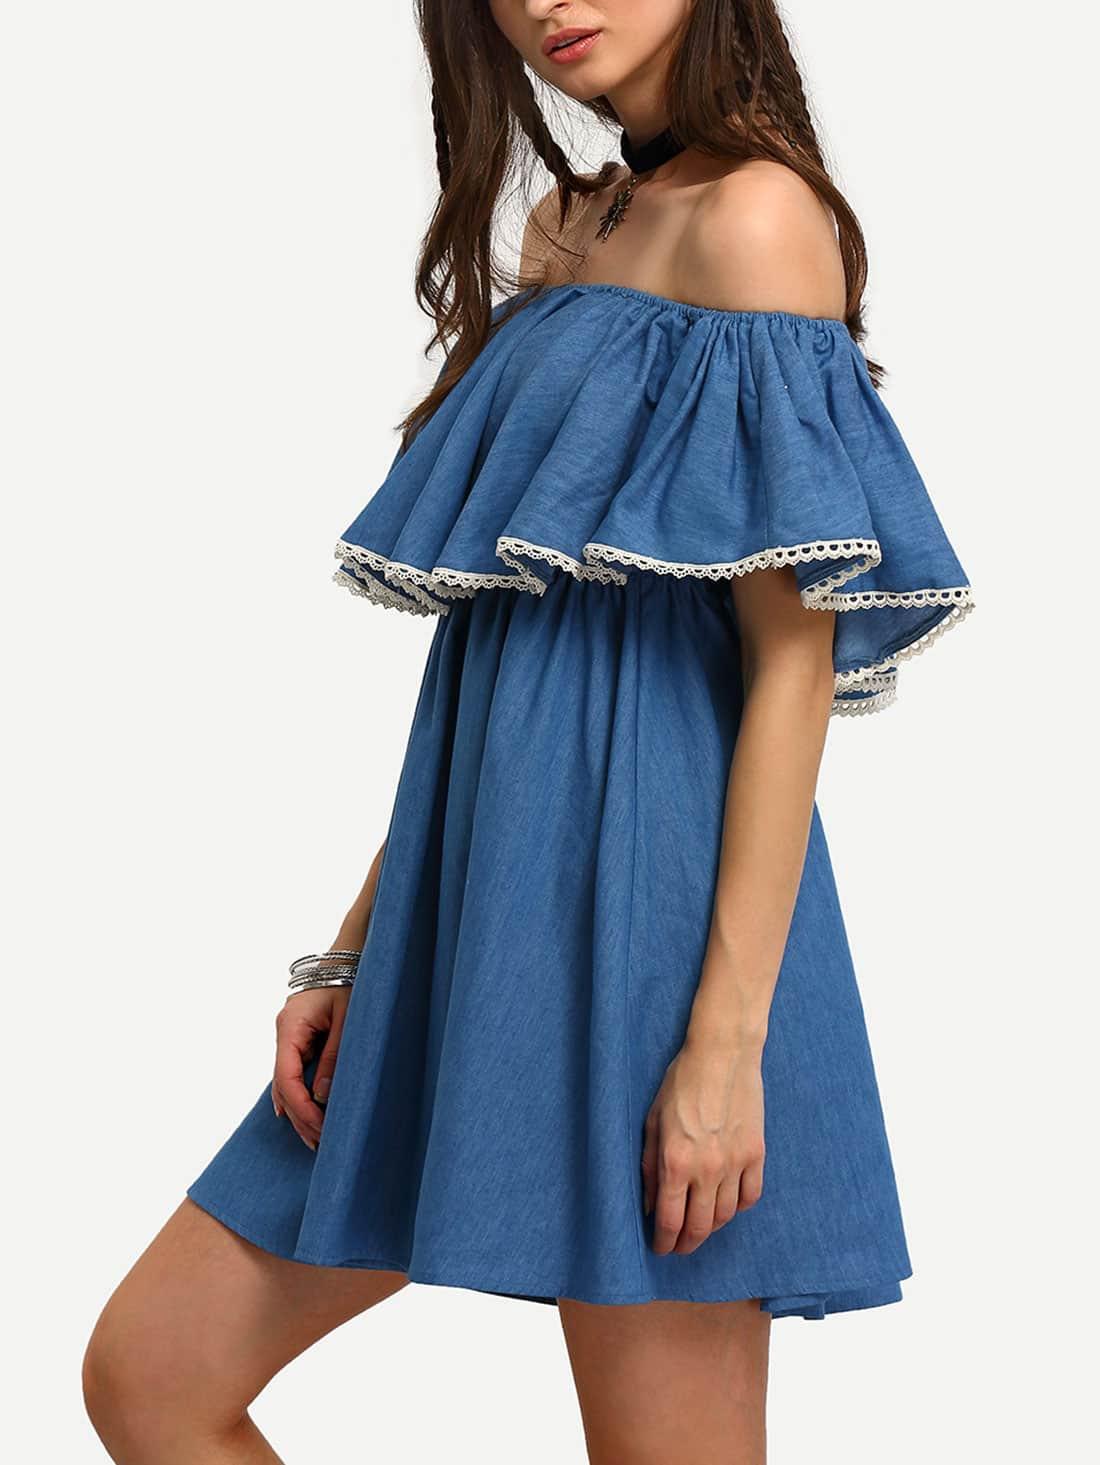 Demin Blue Off The Shoulder Ruffle Swing Dress dress160408712